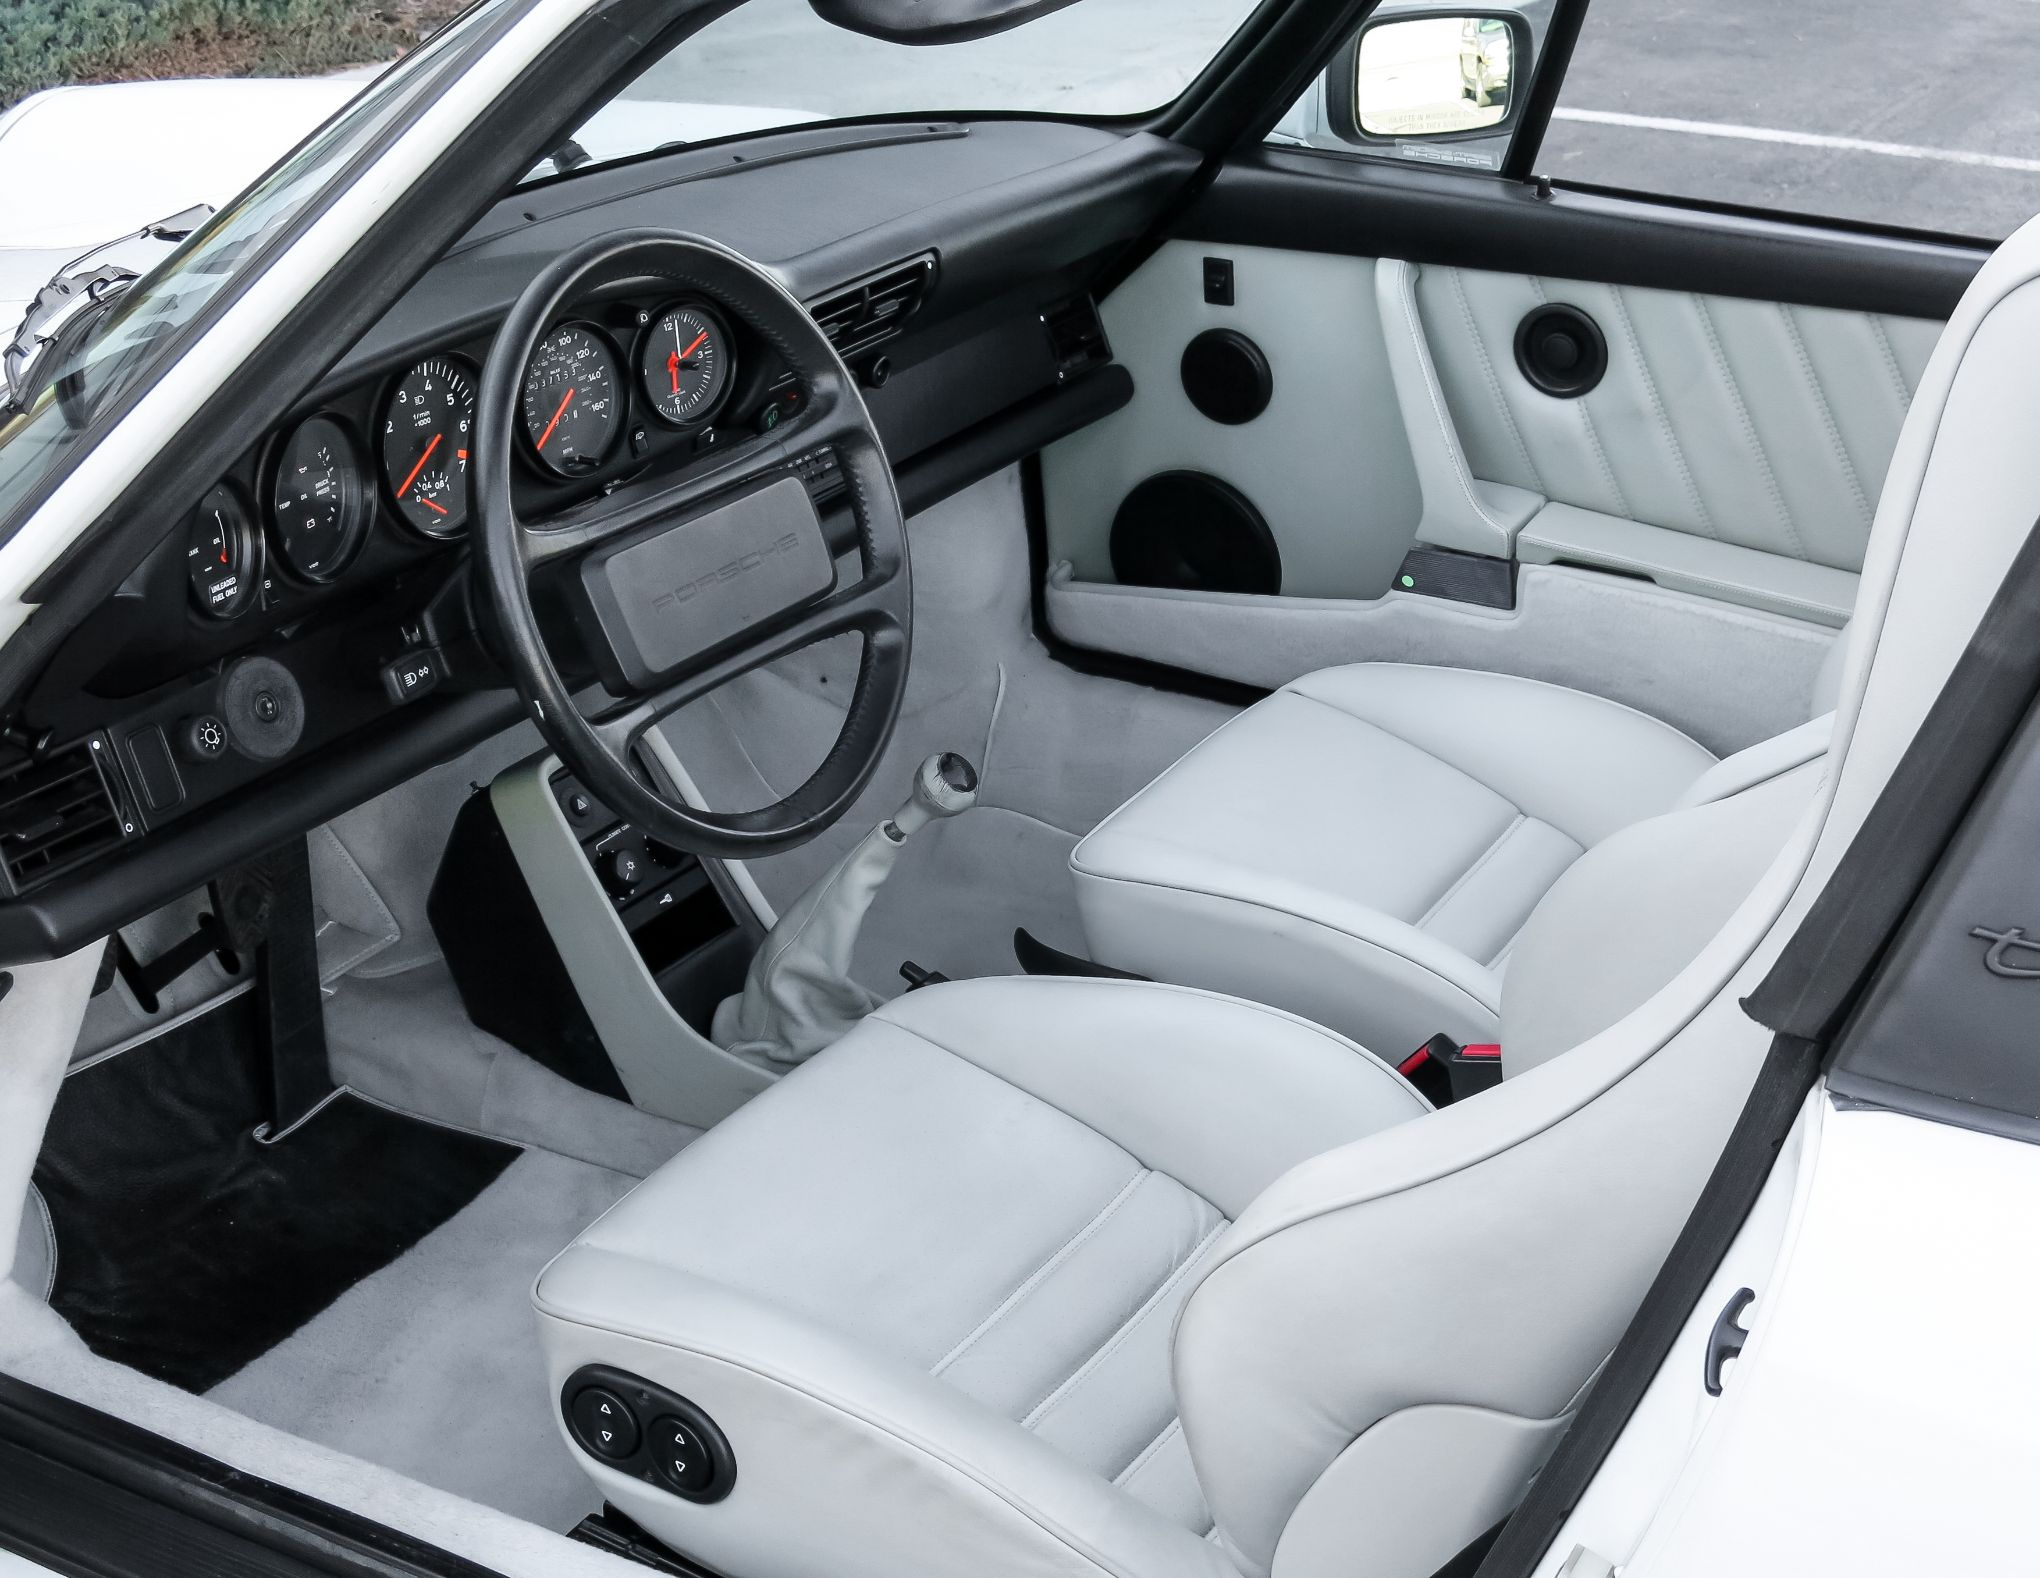 37k Mile 1989 Porsche 930 Turbo Targa G50 Pcarmarket